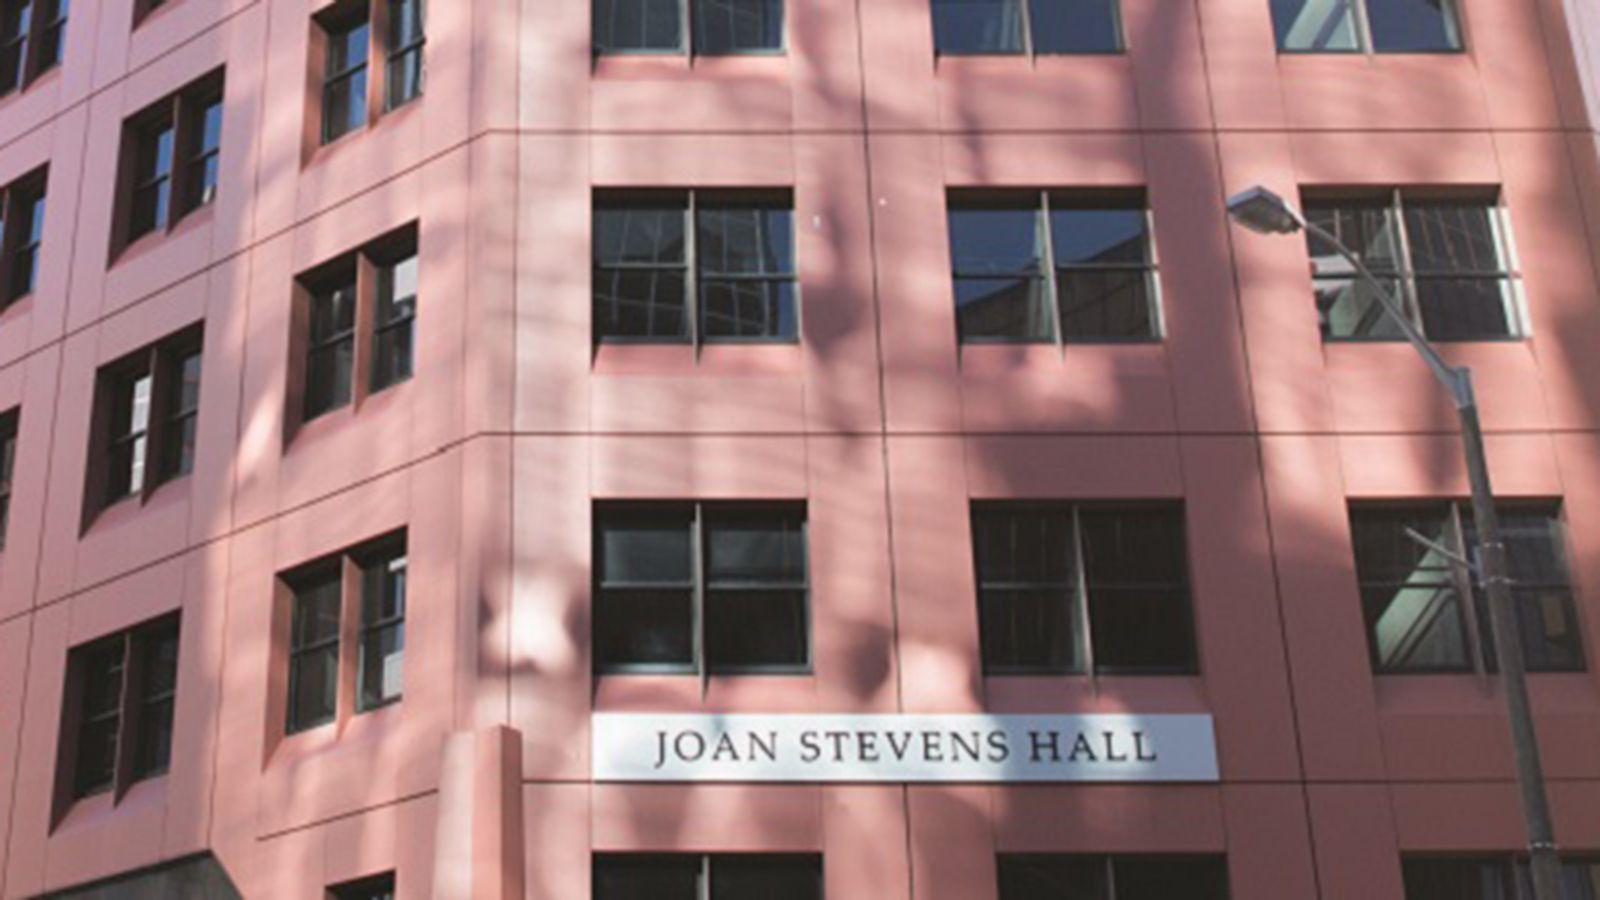 Joan stevens hall